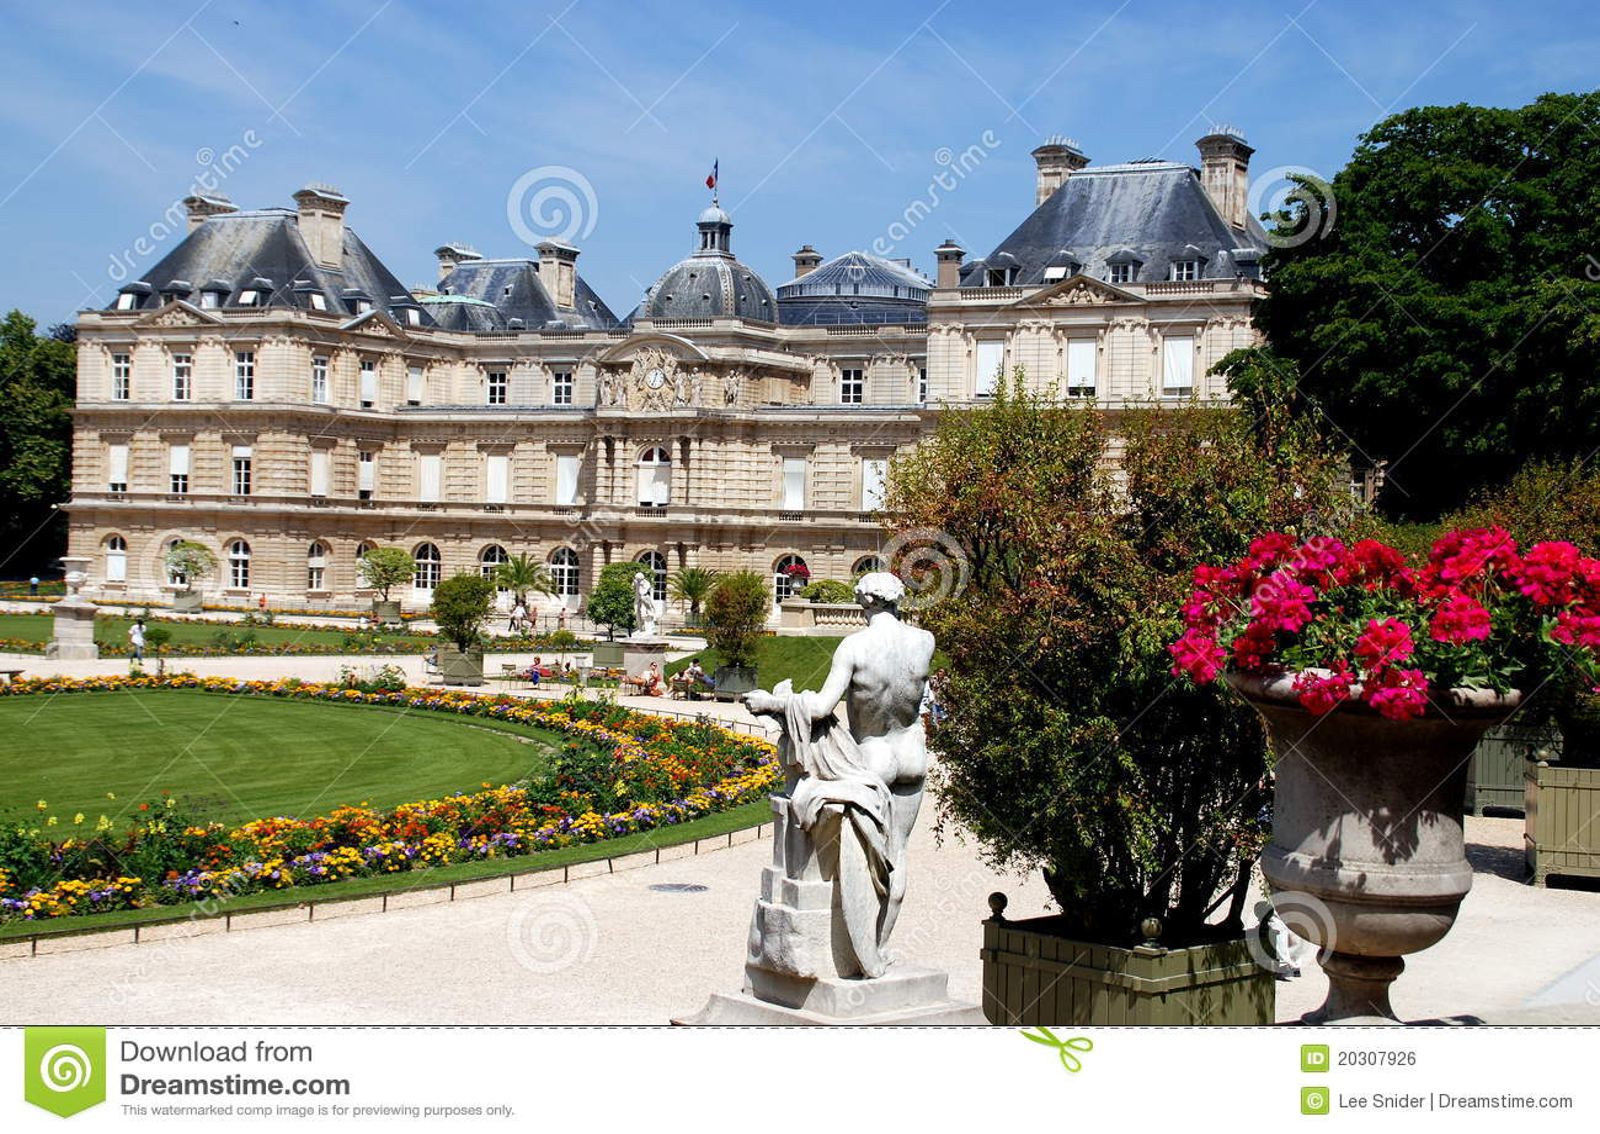 Paris france luxembourg palace gardens editorial photo for Le jardin de catherien